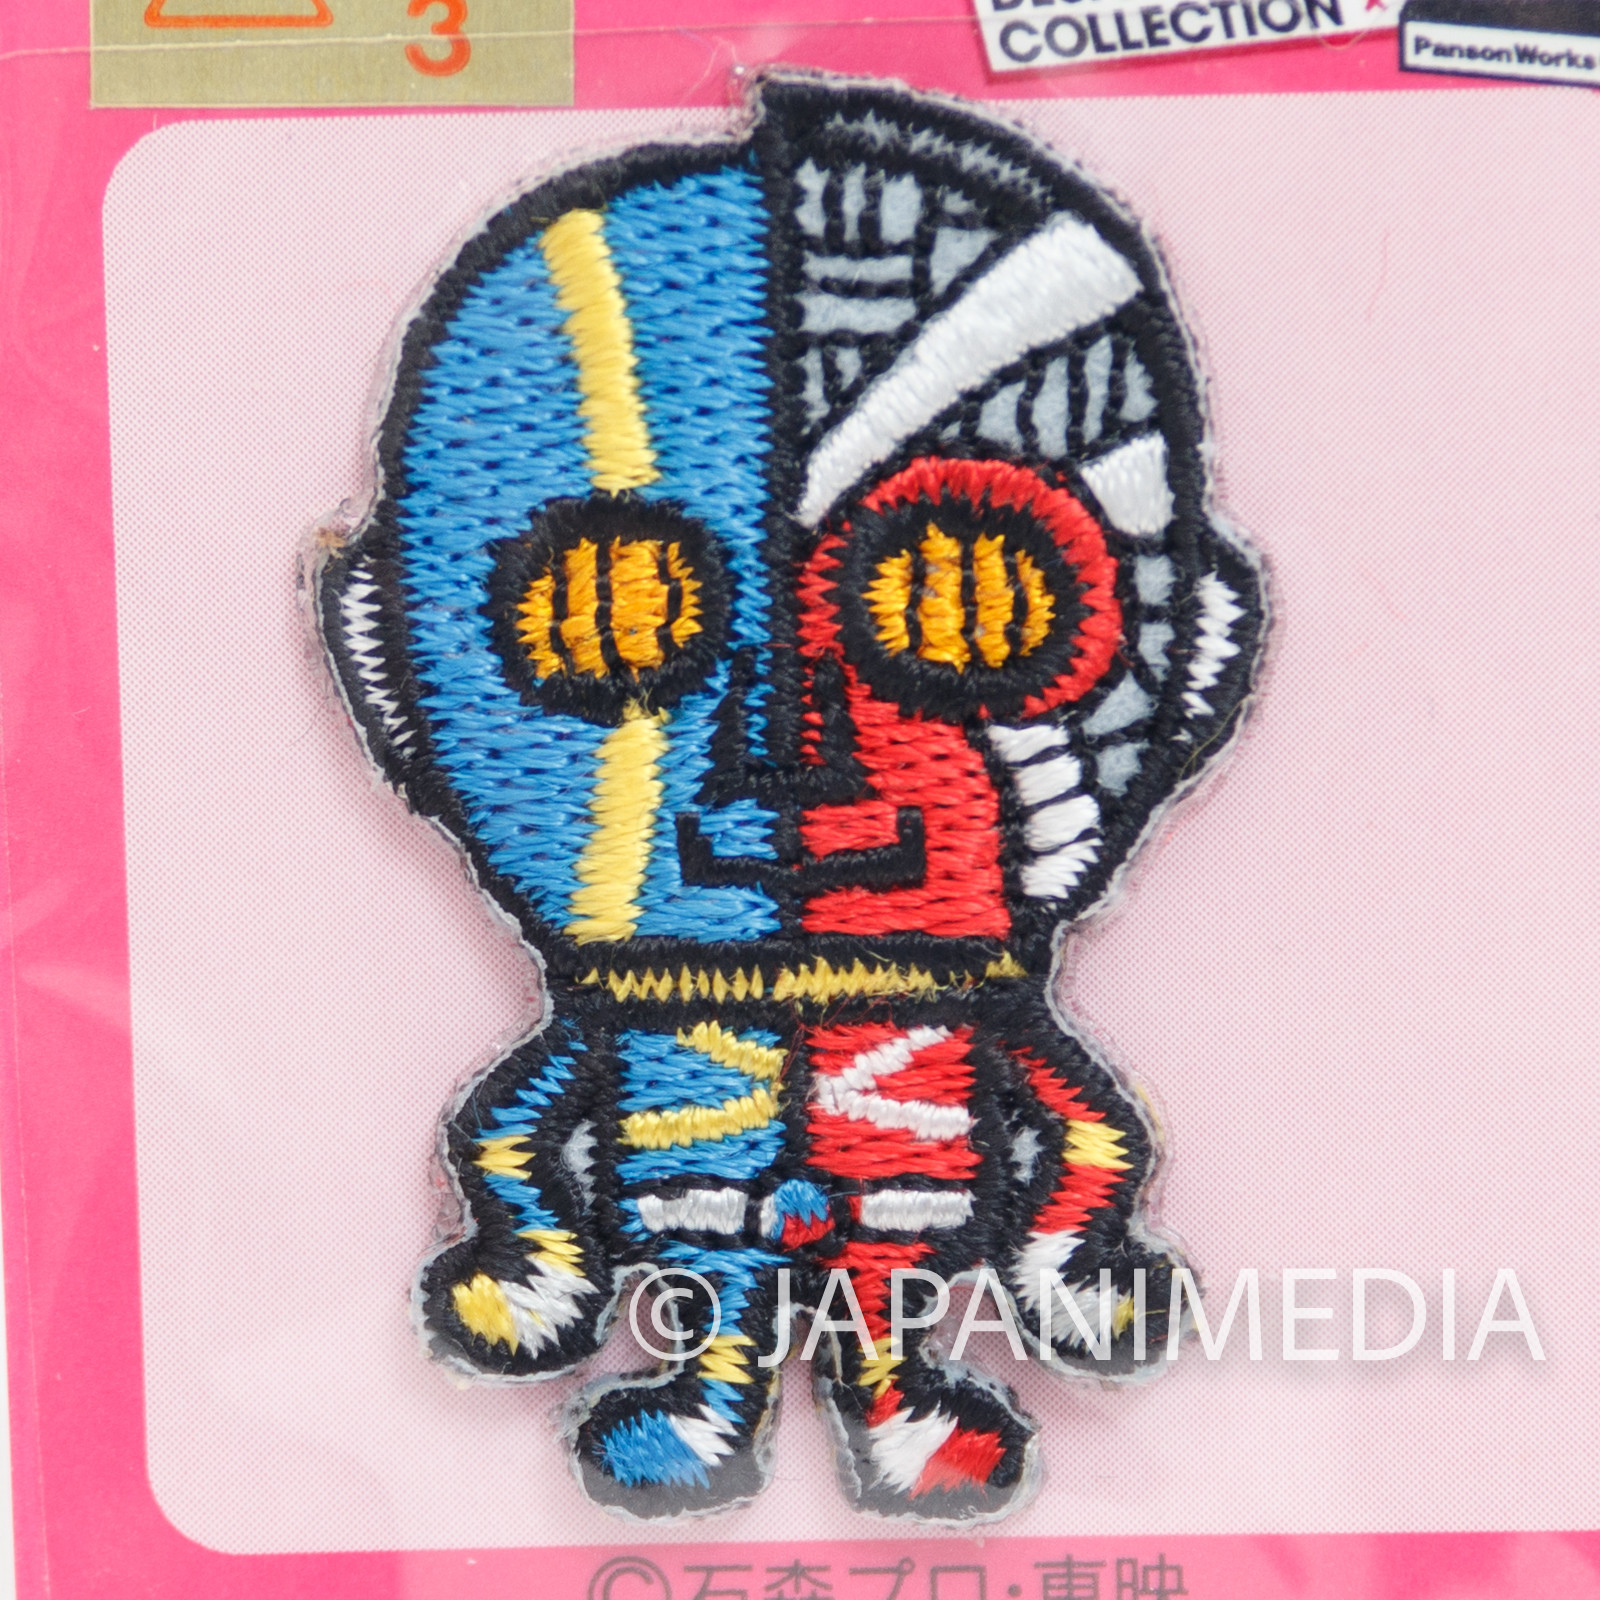 Kikaider x Panson Works Wappen Emblem Badge BANDAI Shotaro Ashinomori JAPAN